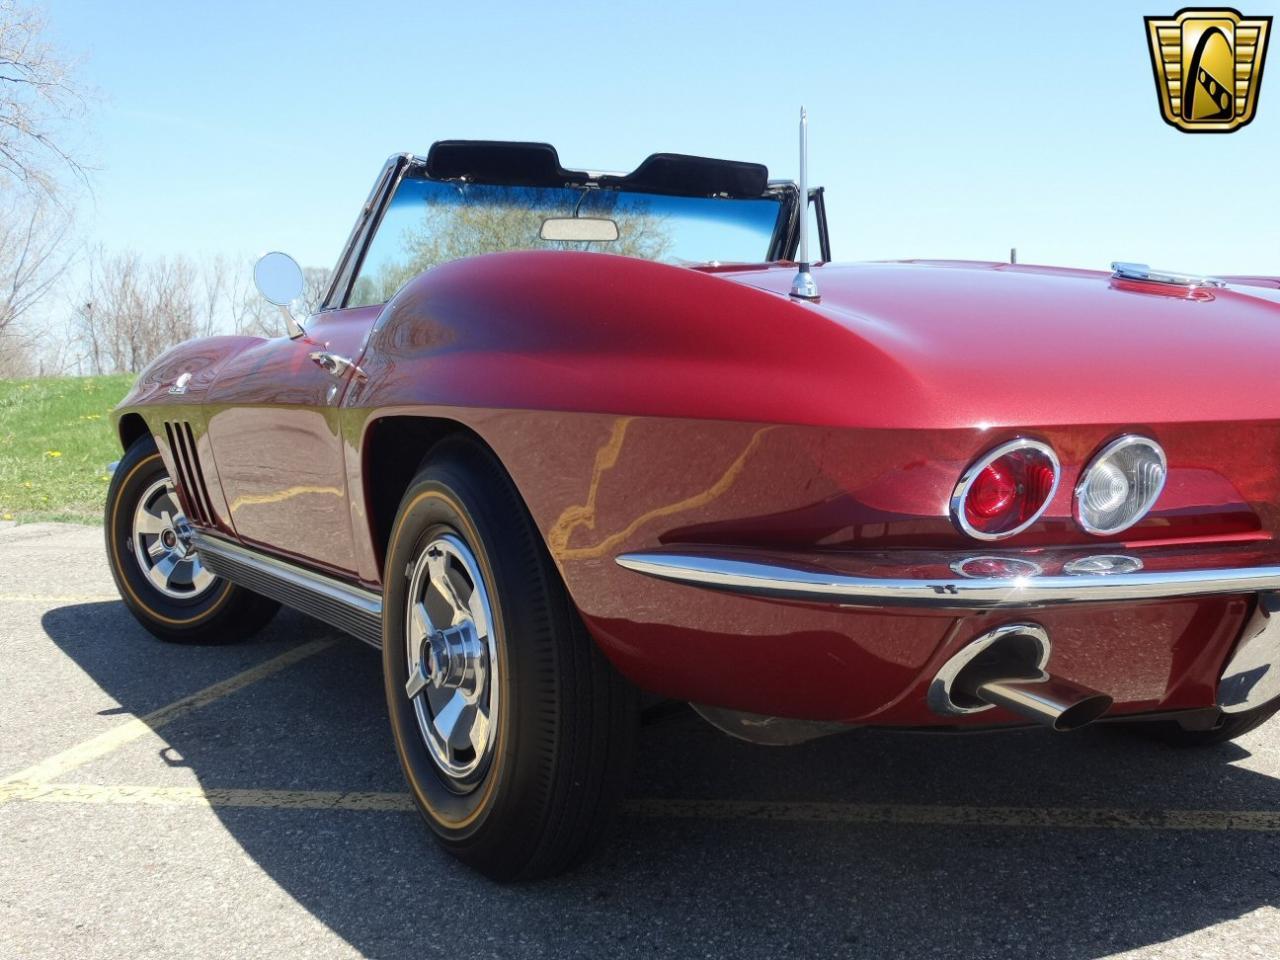 1966 Chevrolet Corvette Stingray 4700 Miles Milano Maroon Chevy Convertible 427 Cid V8 Prevnext